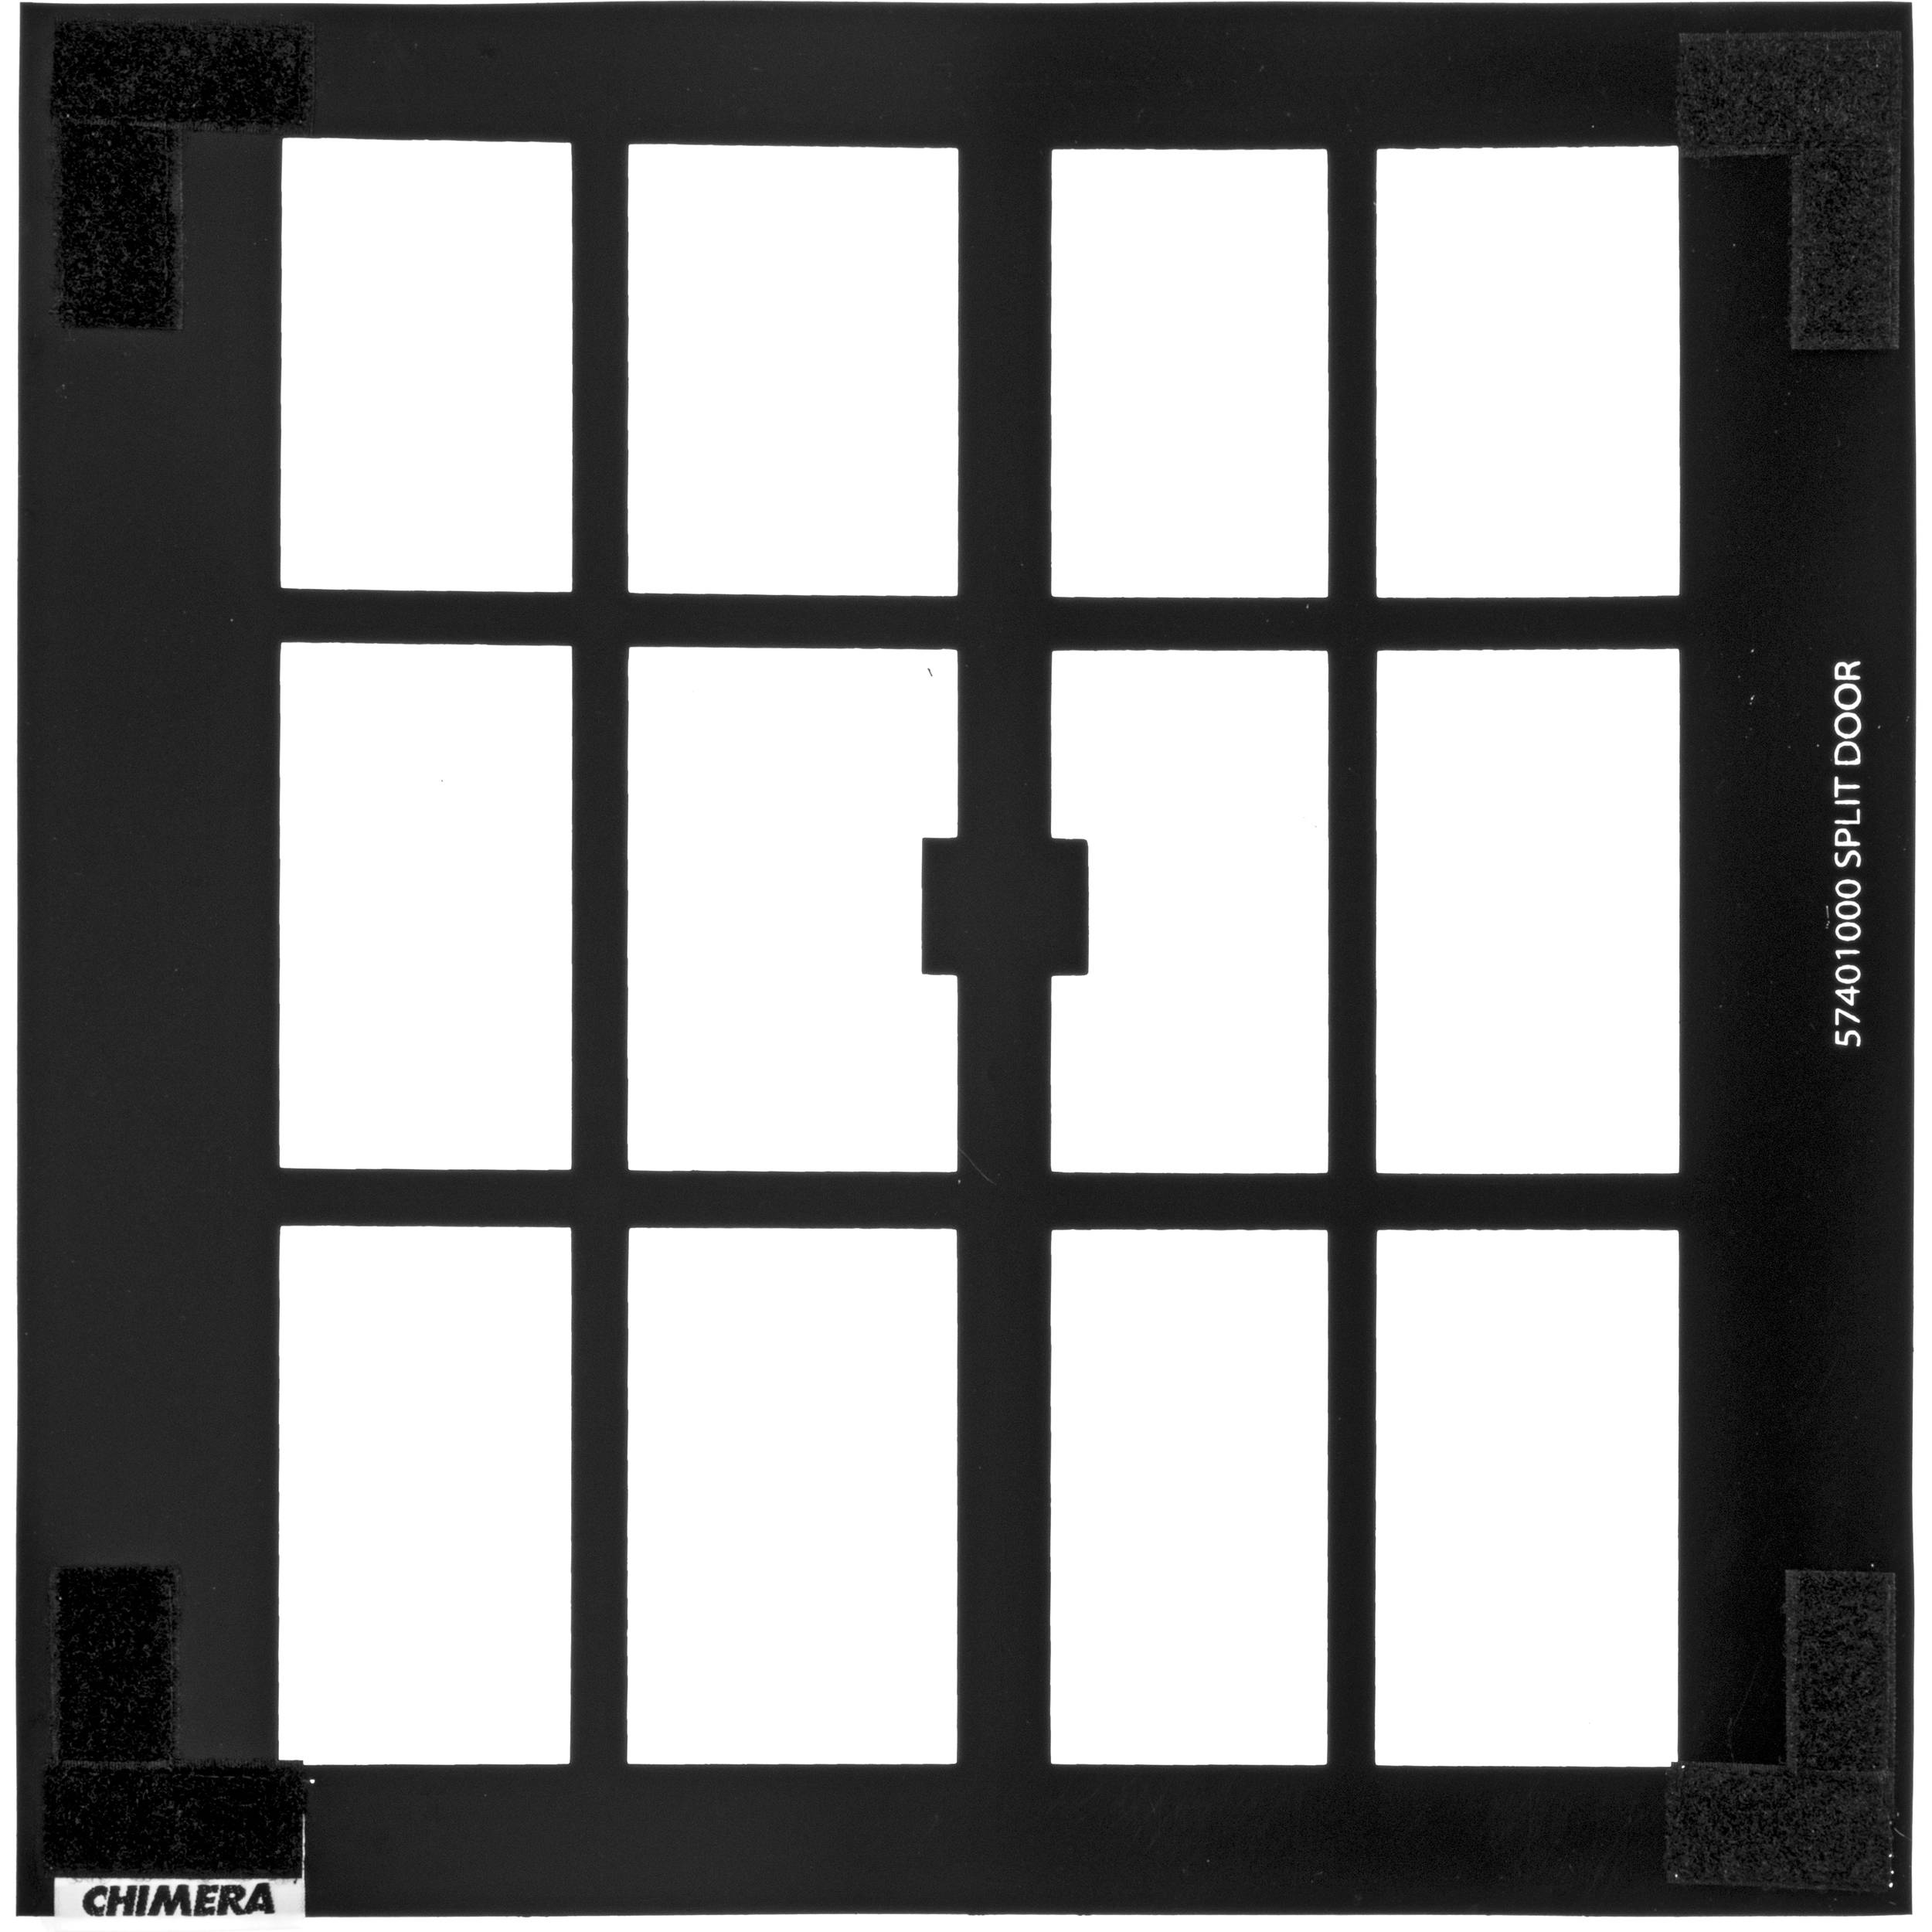 Chimera window pattern for 24x24 frame